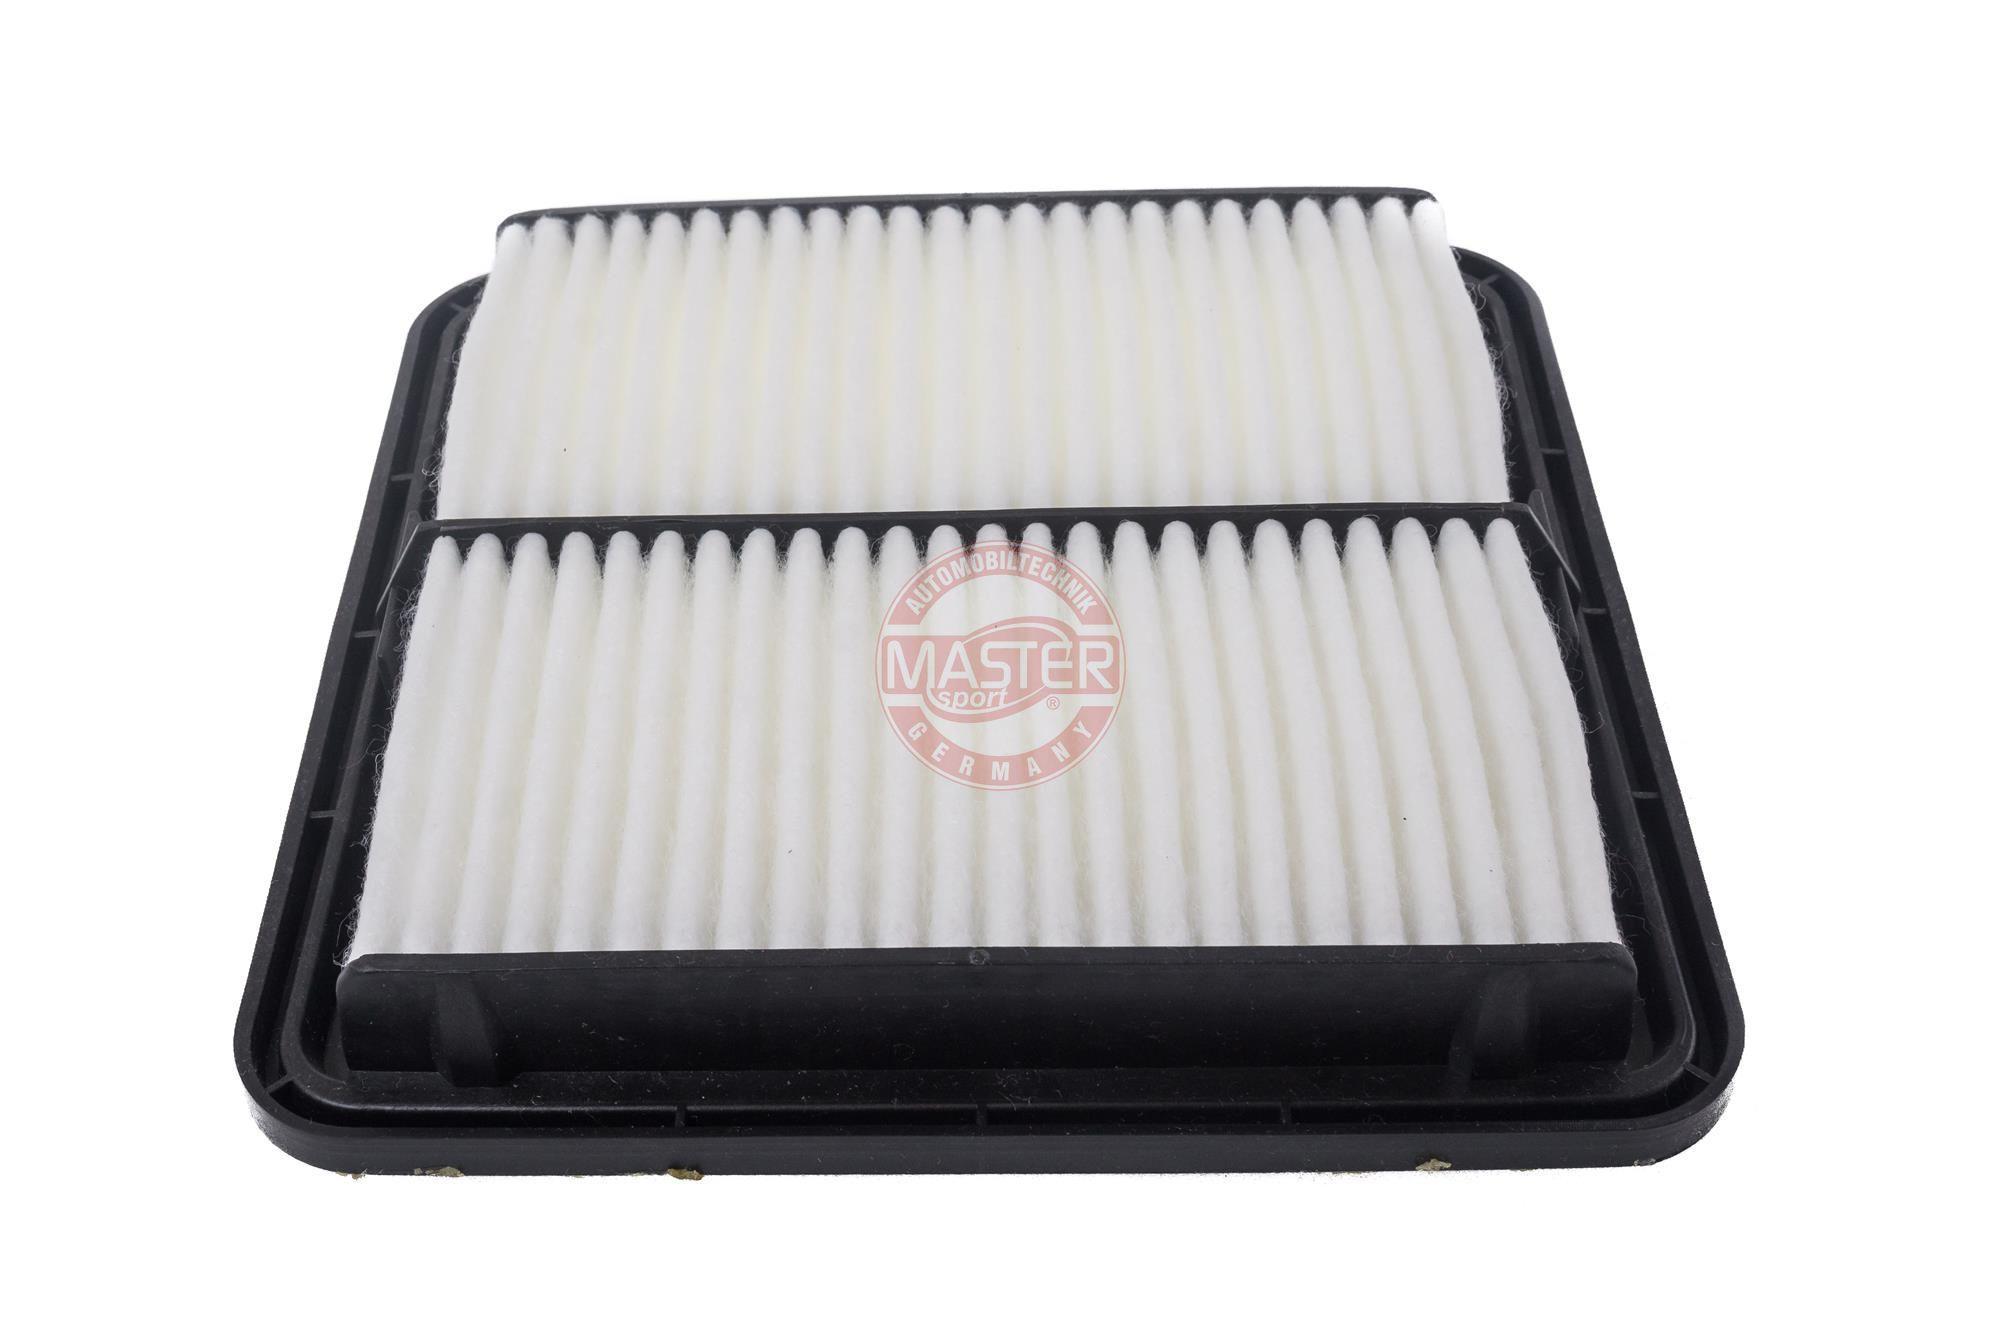 Luftfilter 2201-LF-PCS-MS MASTER-SPORT 410022010 in Original Qualität